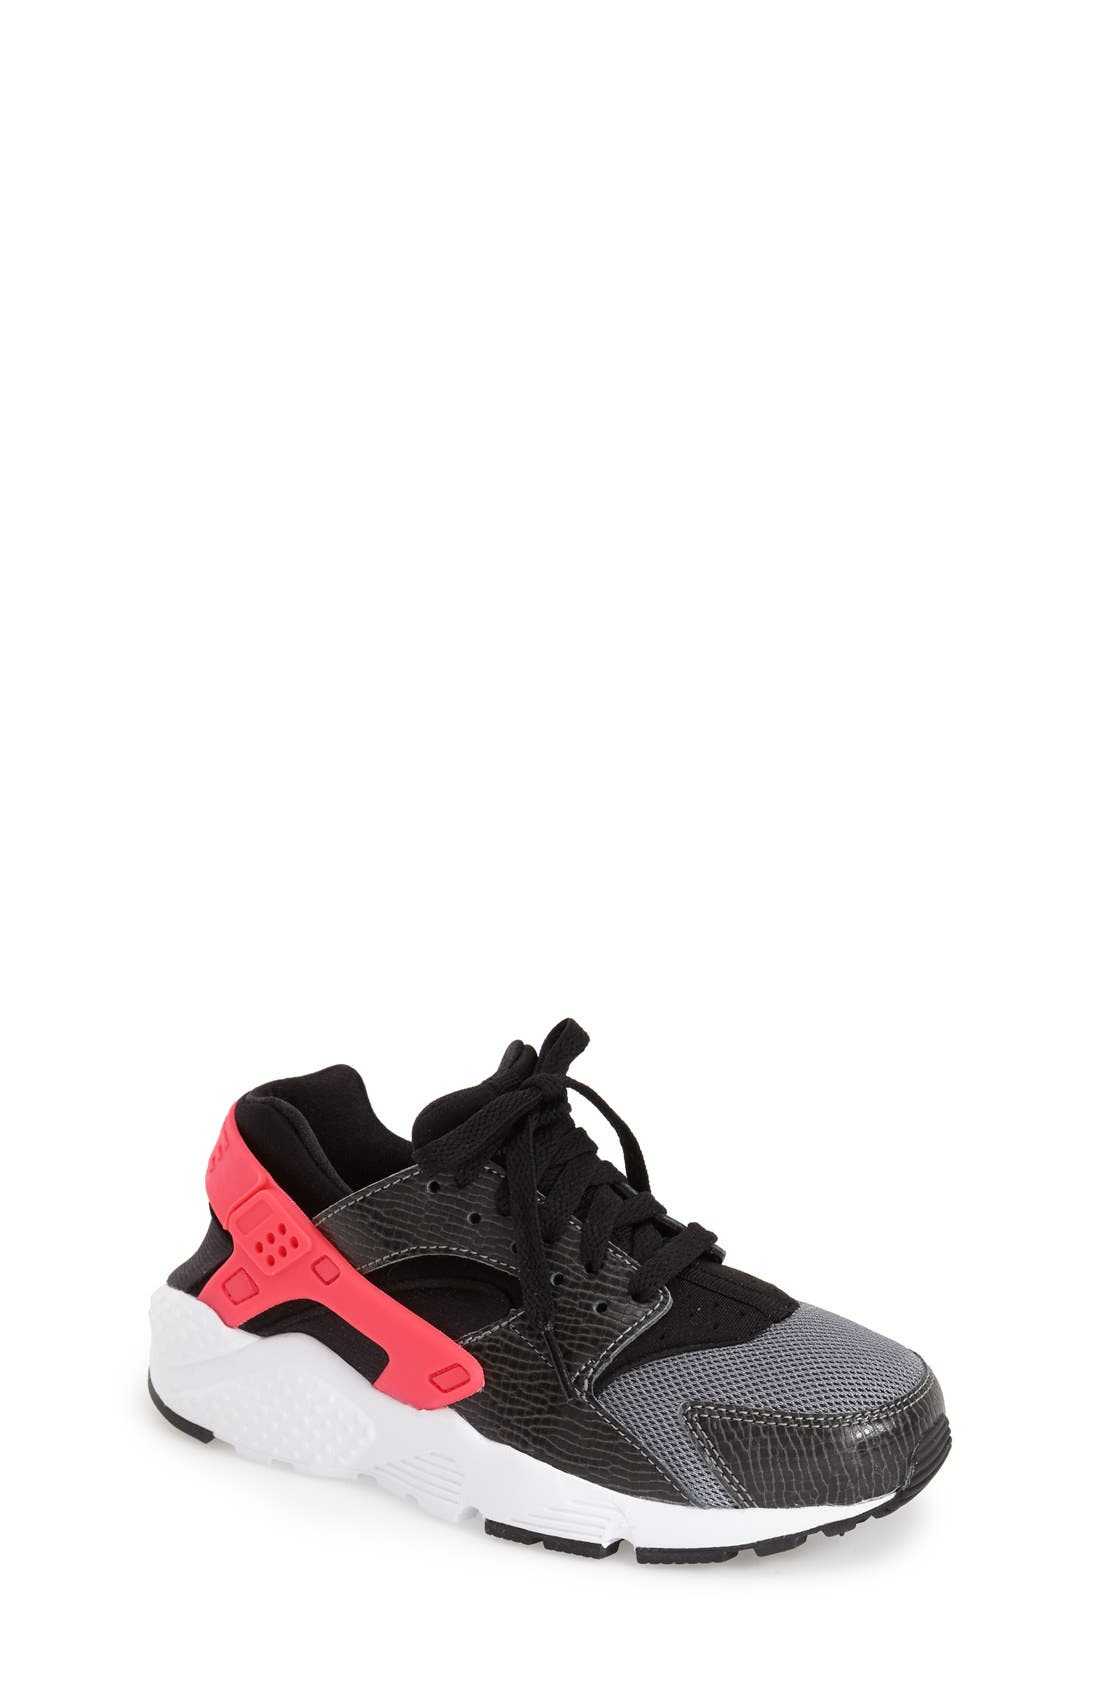 NIKE 'Huarache' Sneaker, Main, color, 010